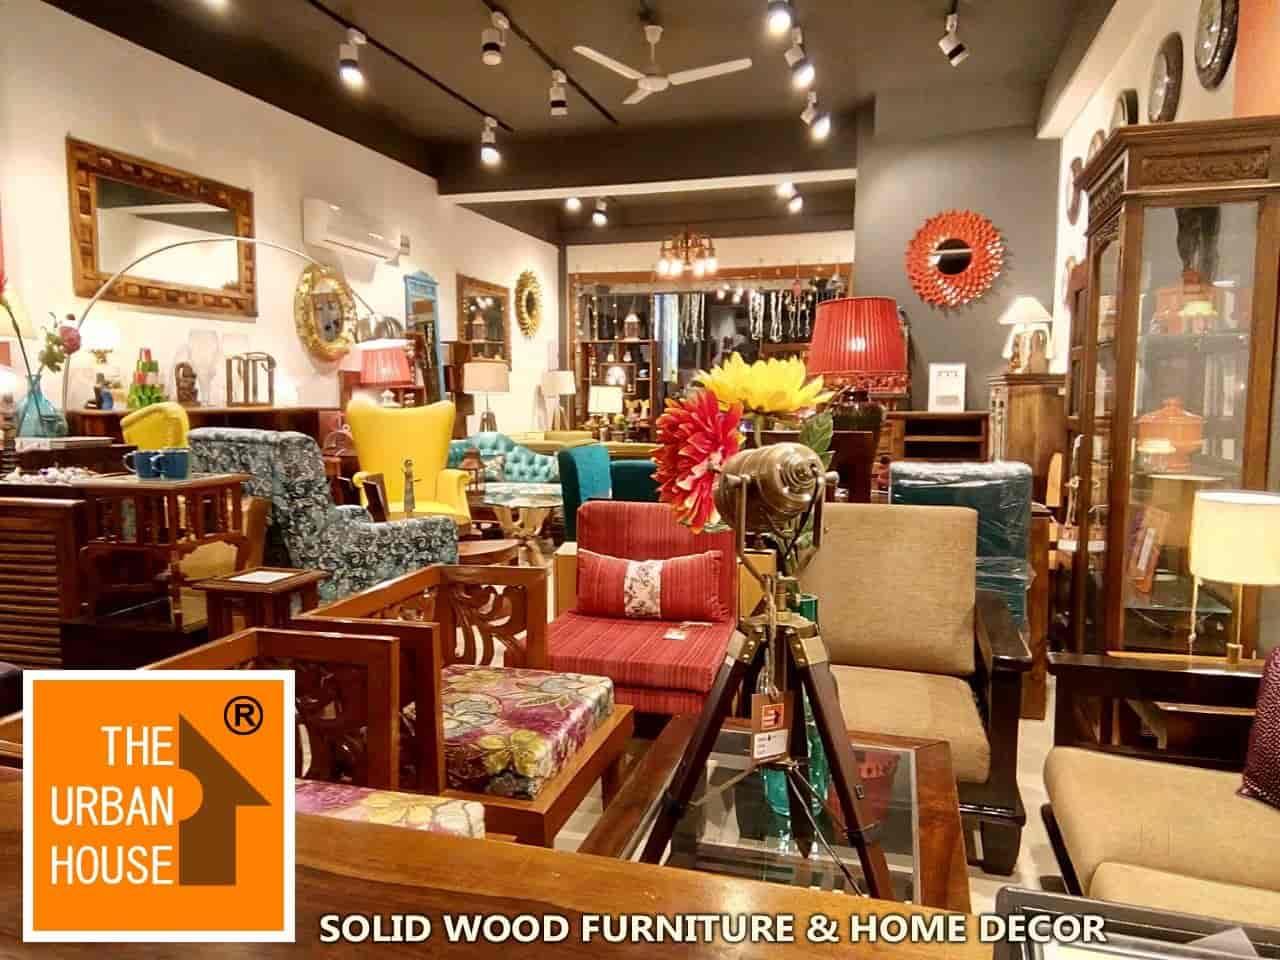 Urban house furniture Store Justdial The Urban House Nehru Nagar Furniture Dealers In Agra Justdial